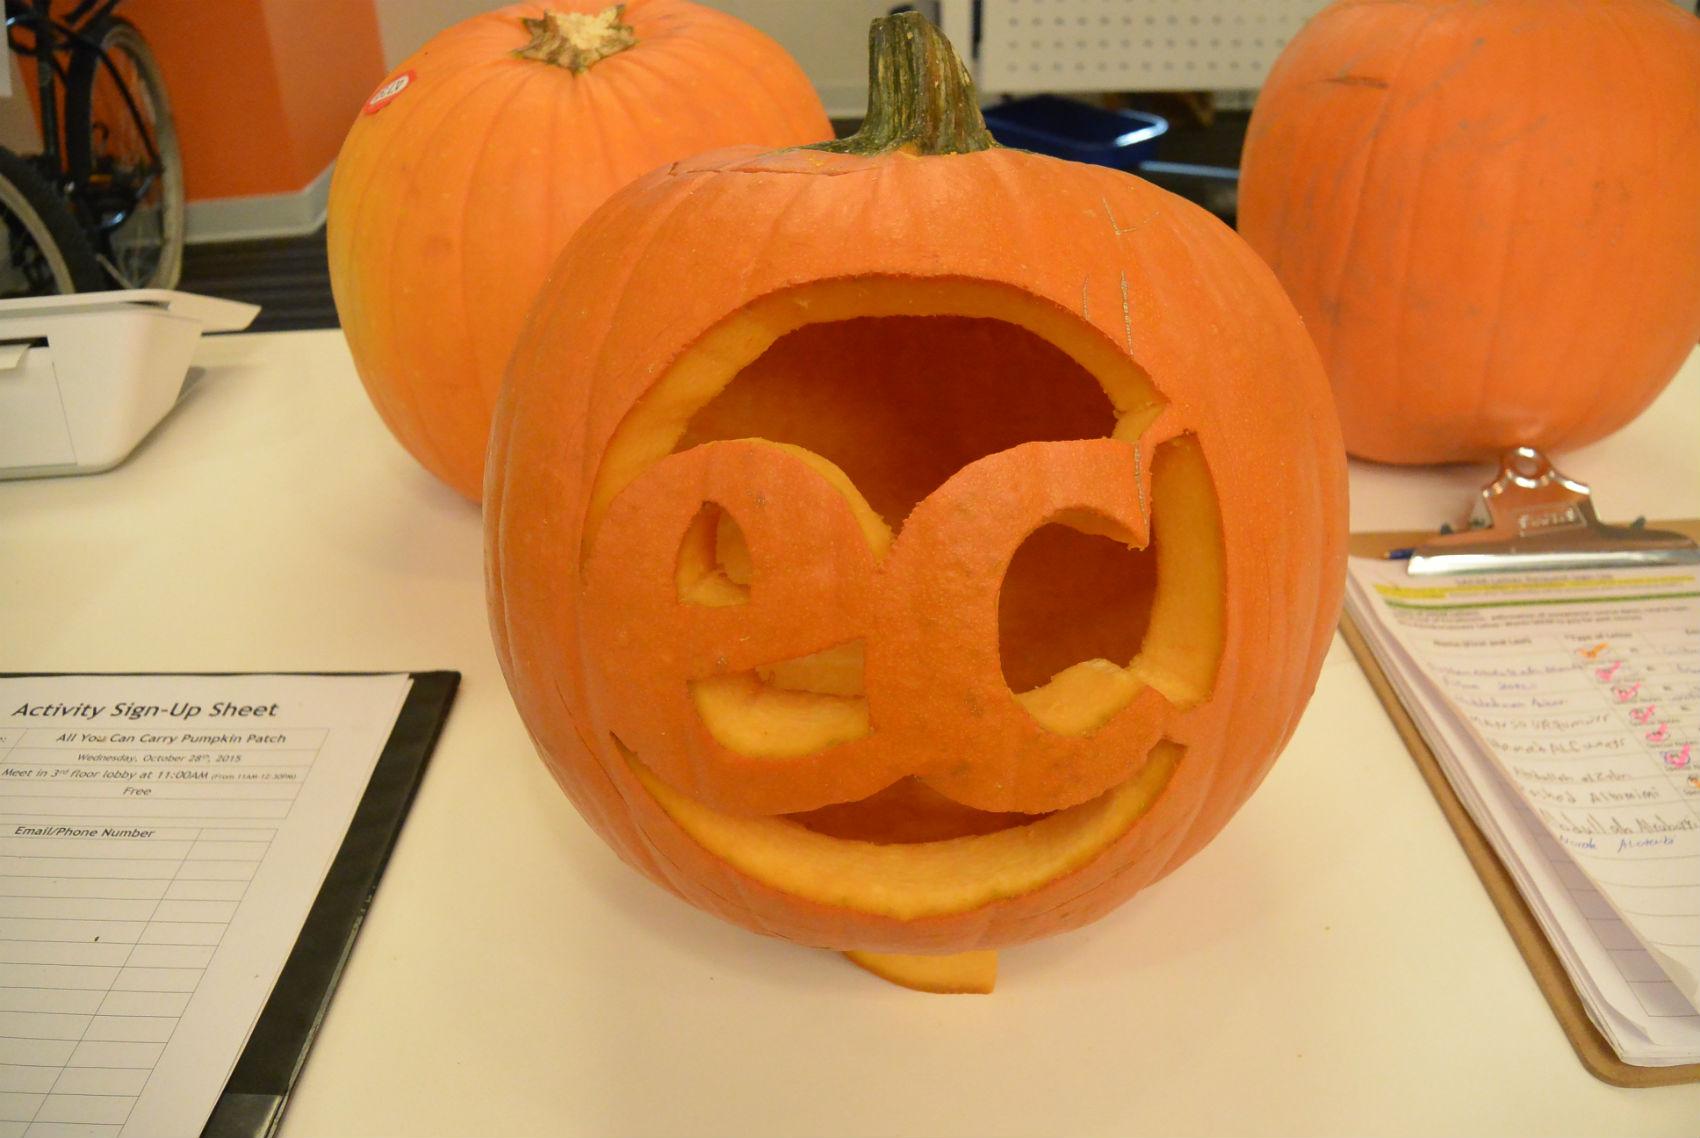 ECLA's staff carved a pumpkin!